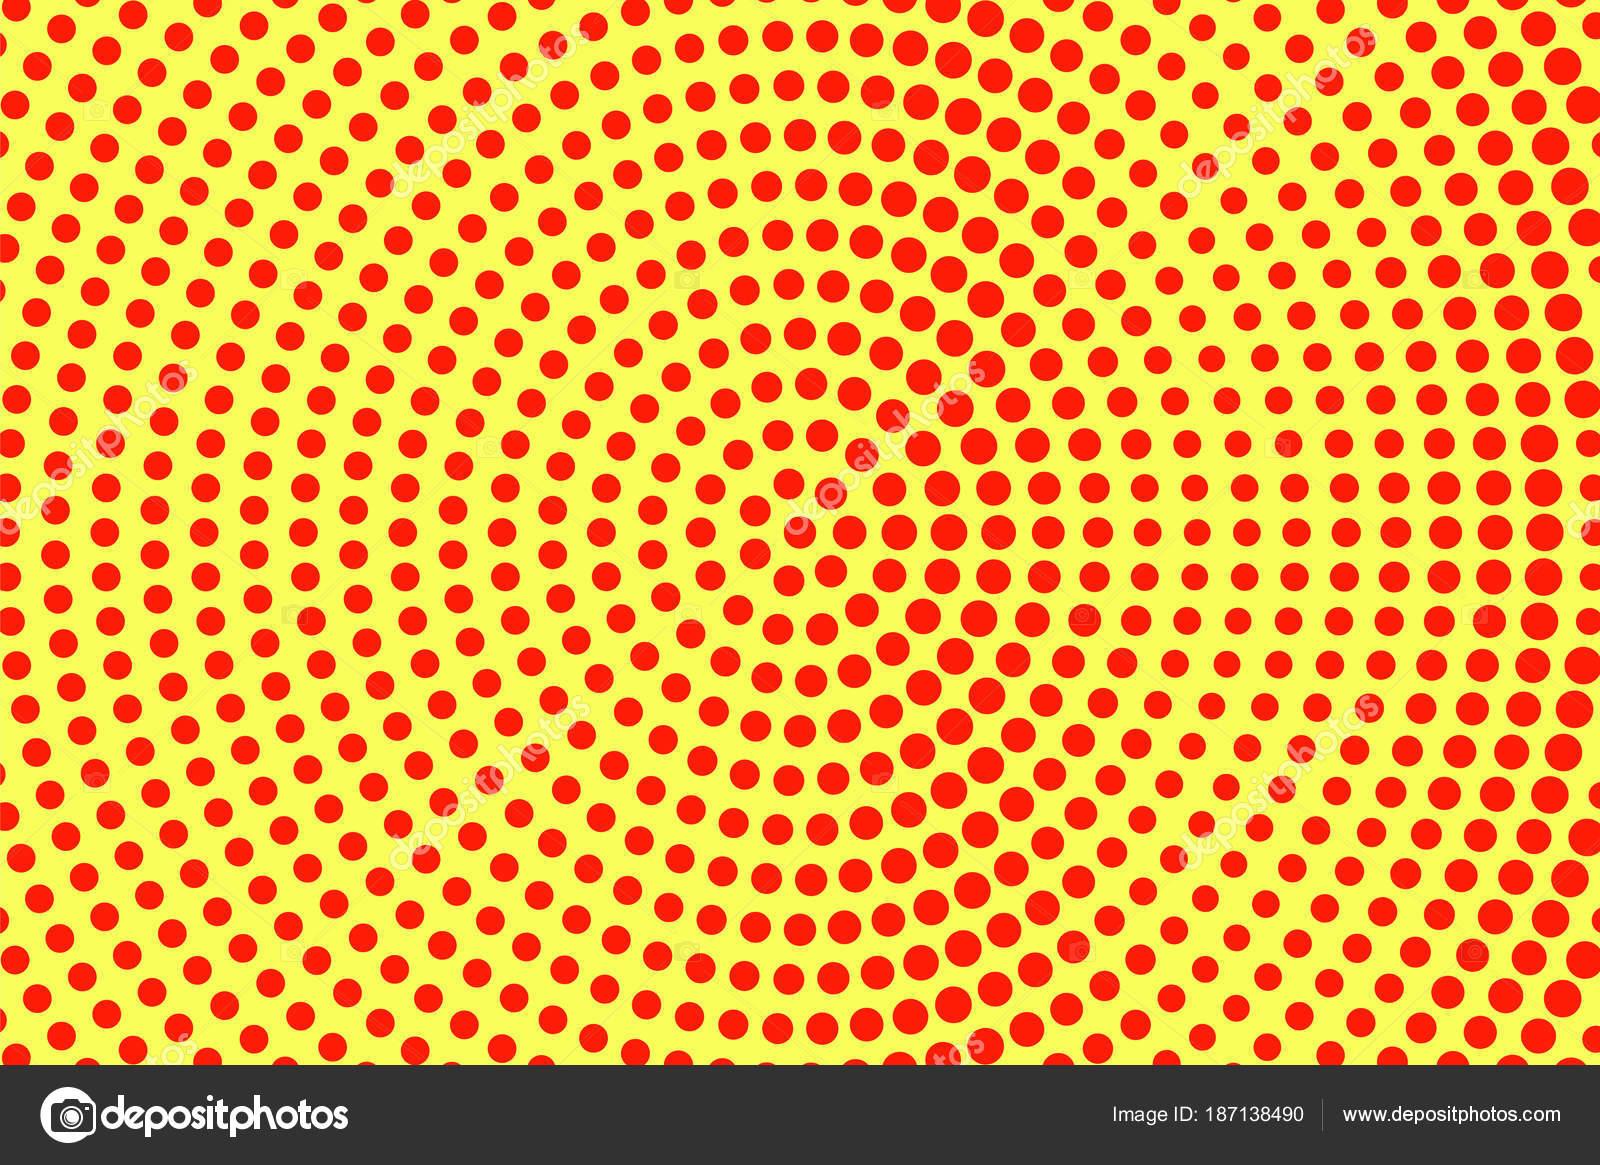 Amarillo rojo puntea trama de semitonos. Gran tamaño radial ...